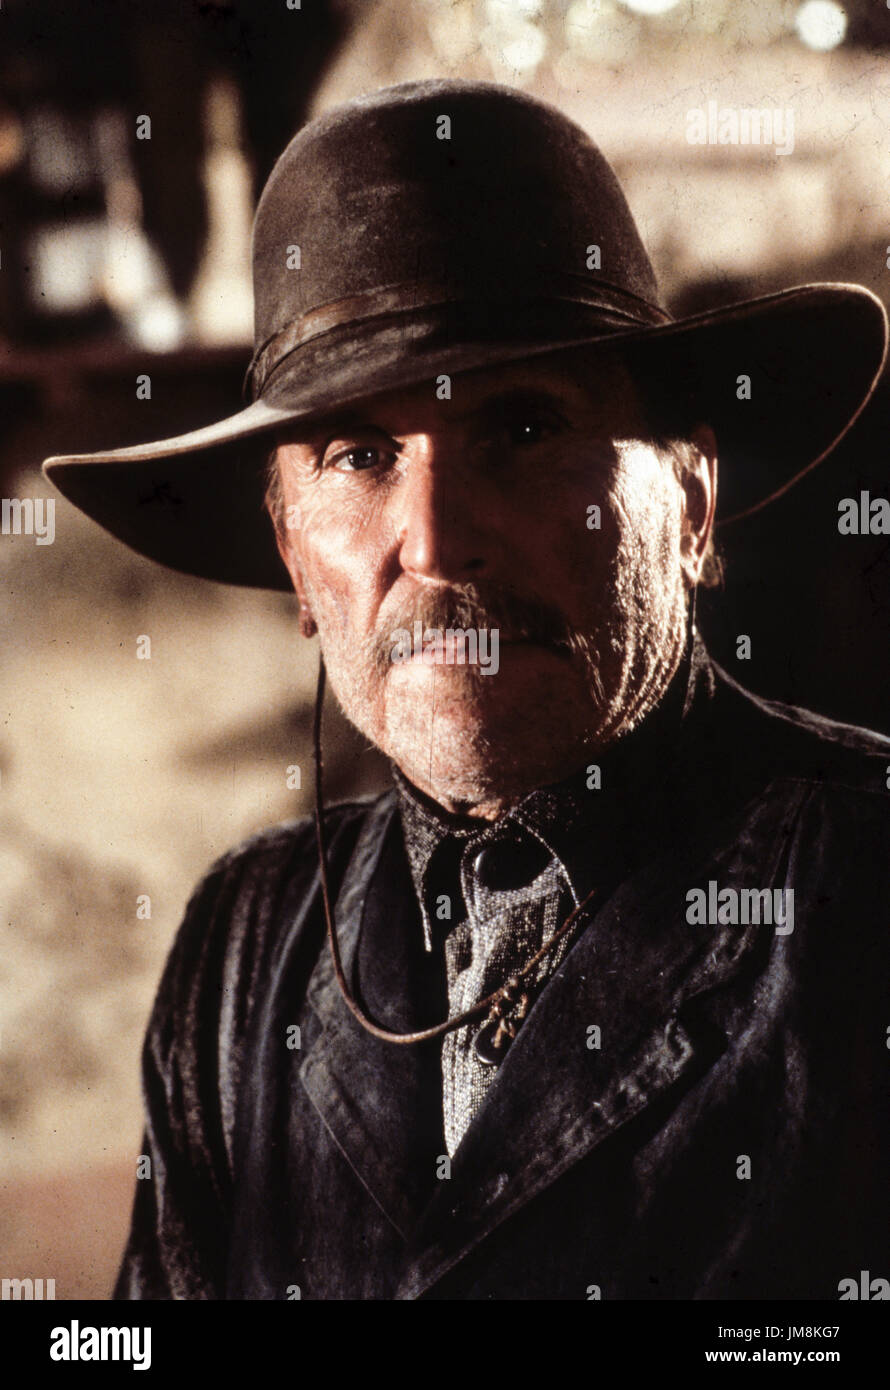 Robert Duvall, geronimo una leggenda americana, 1993 Immagini Stock